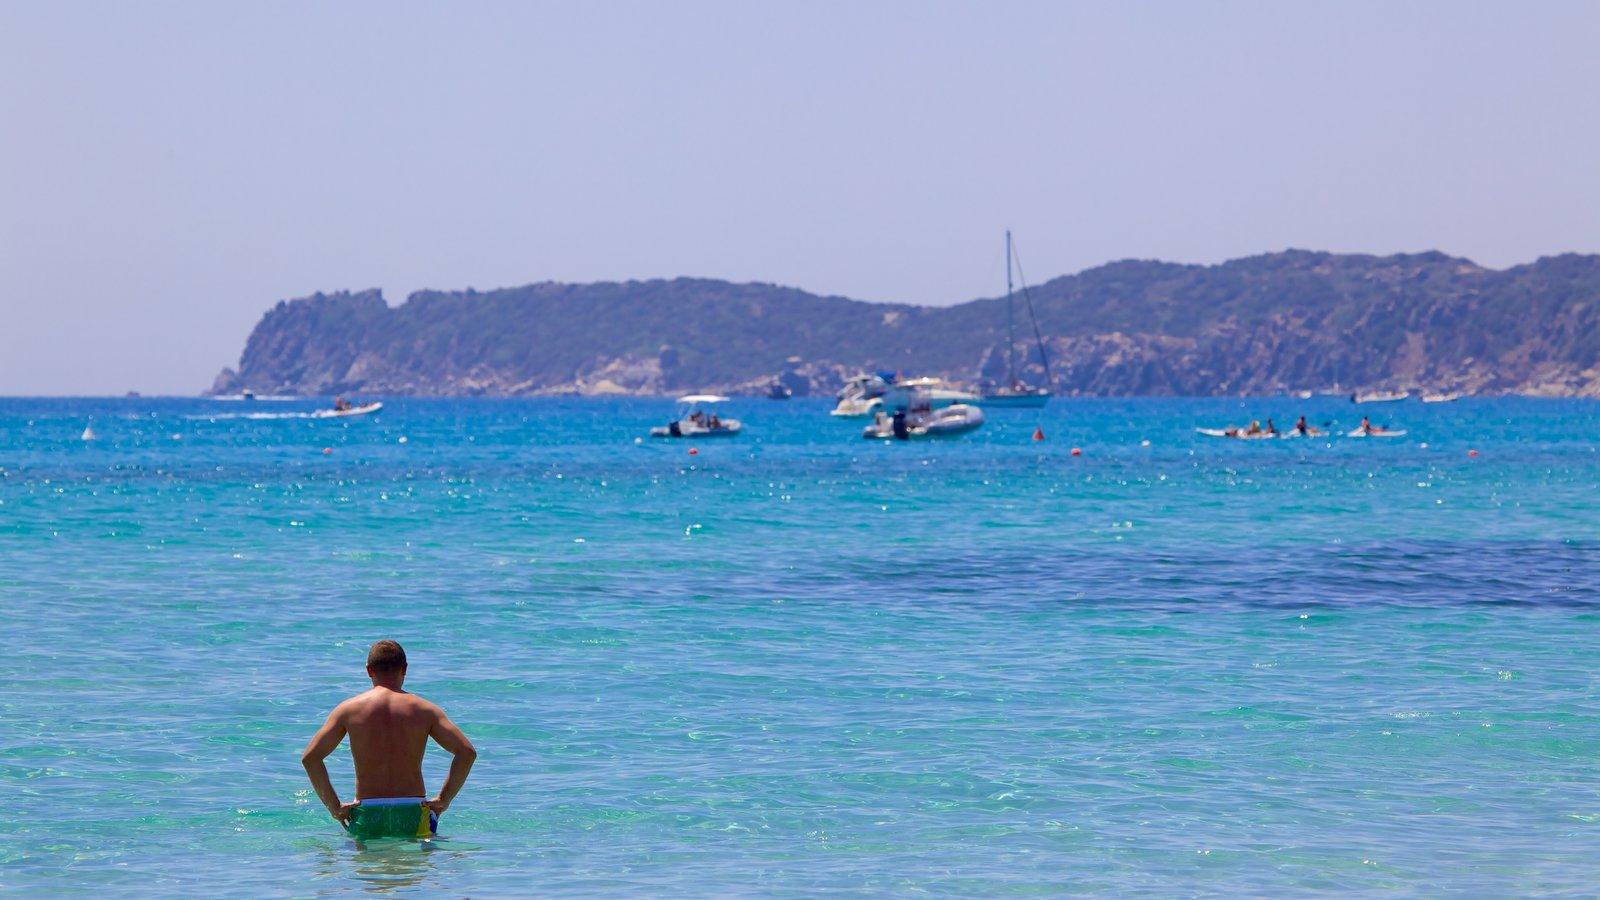 Simius Beach featuring boating, rocky coastline and general coastal views